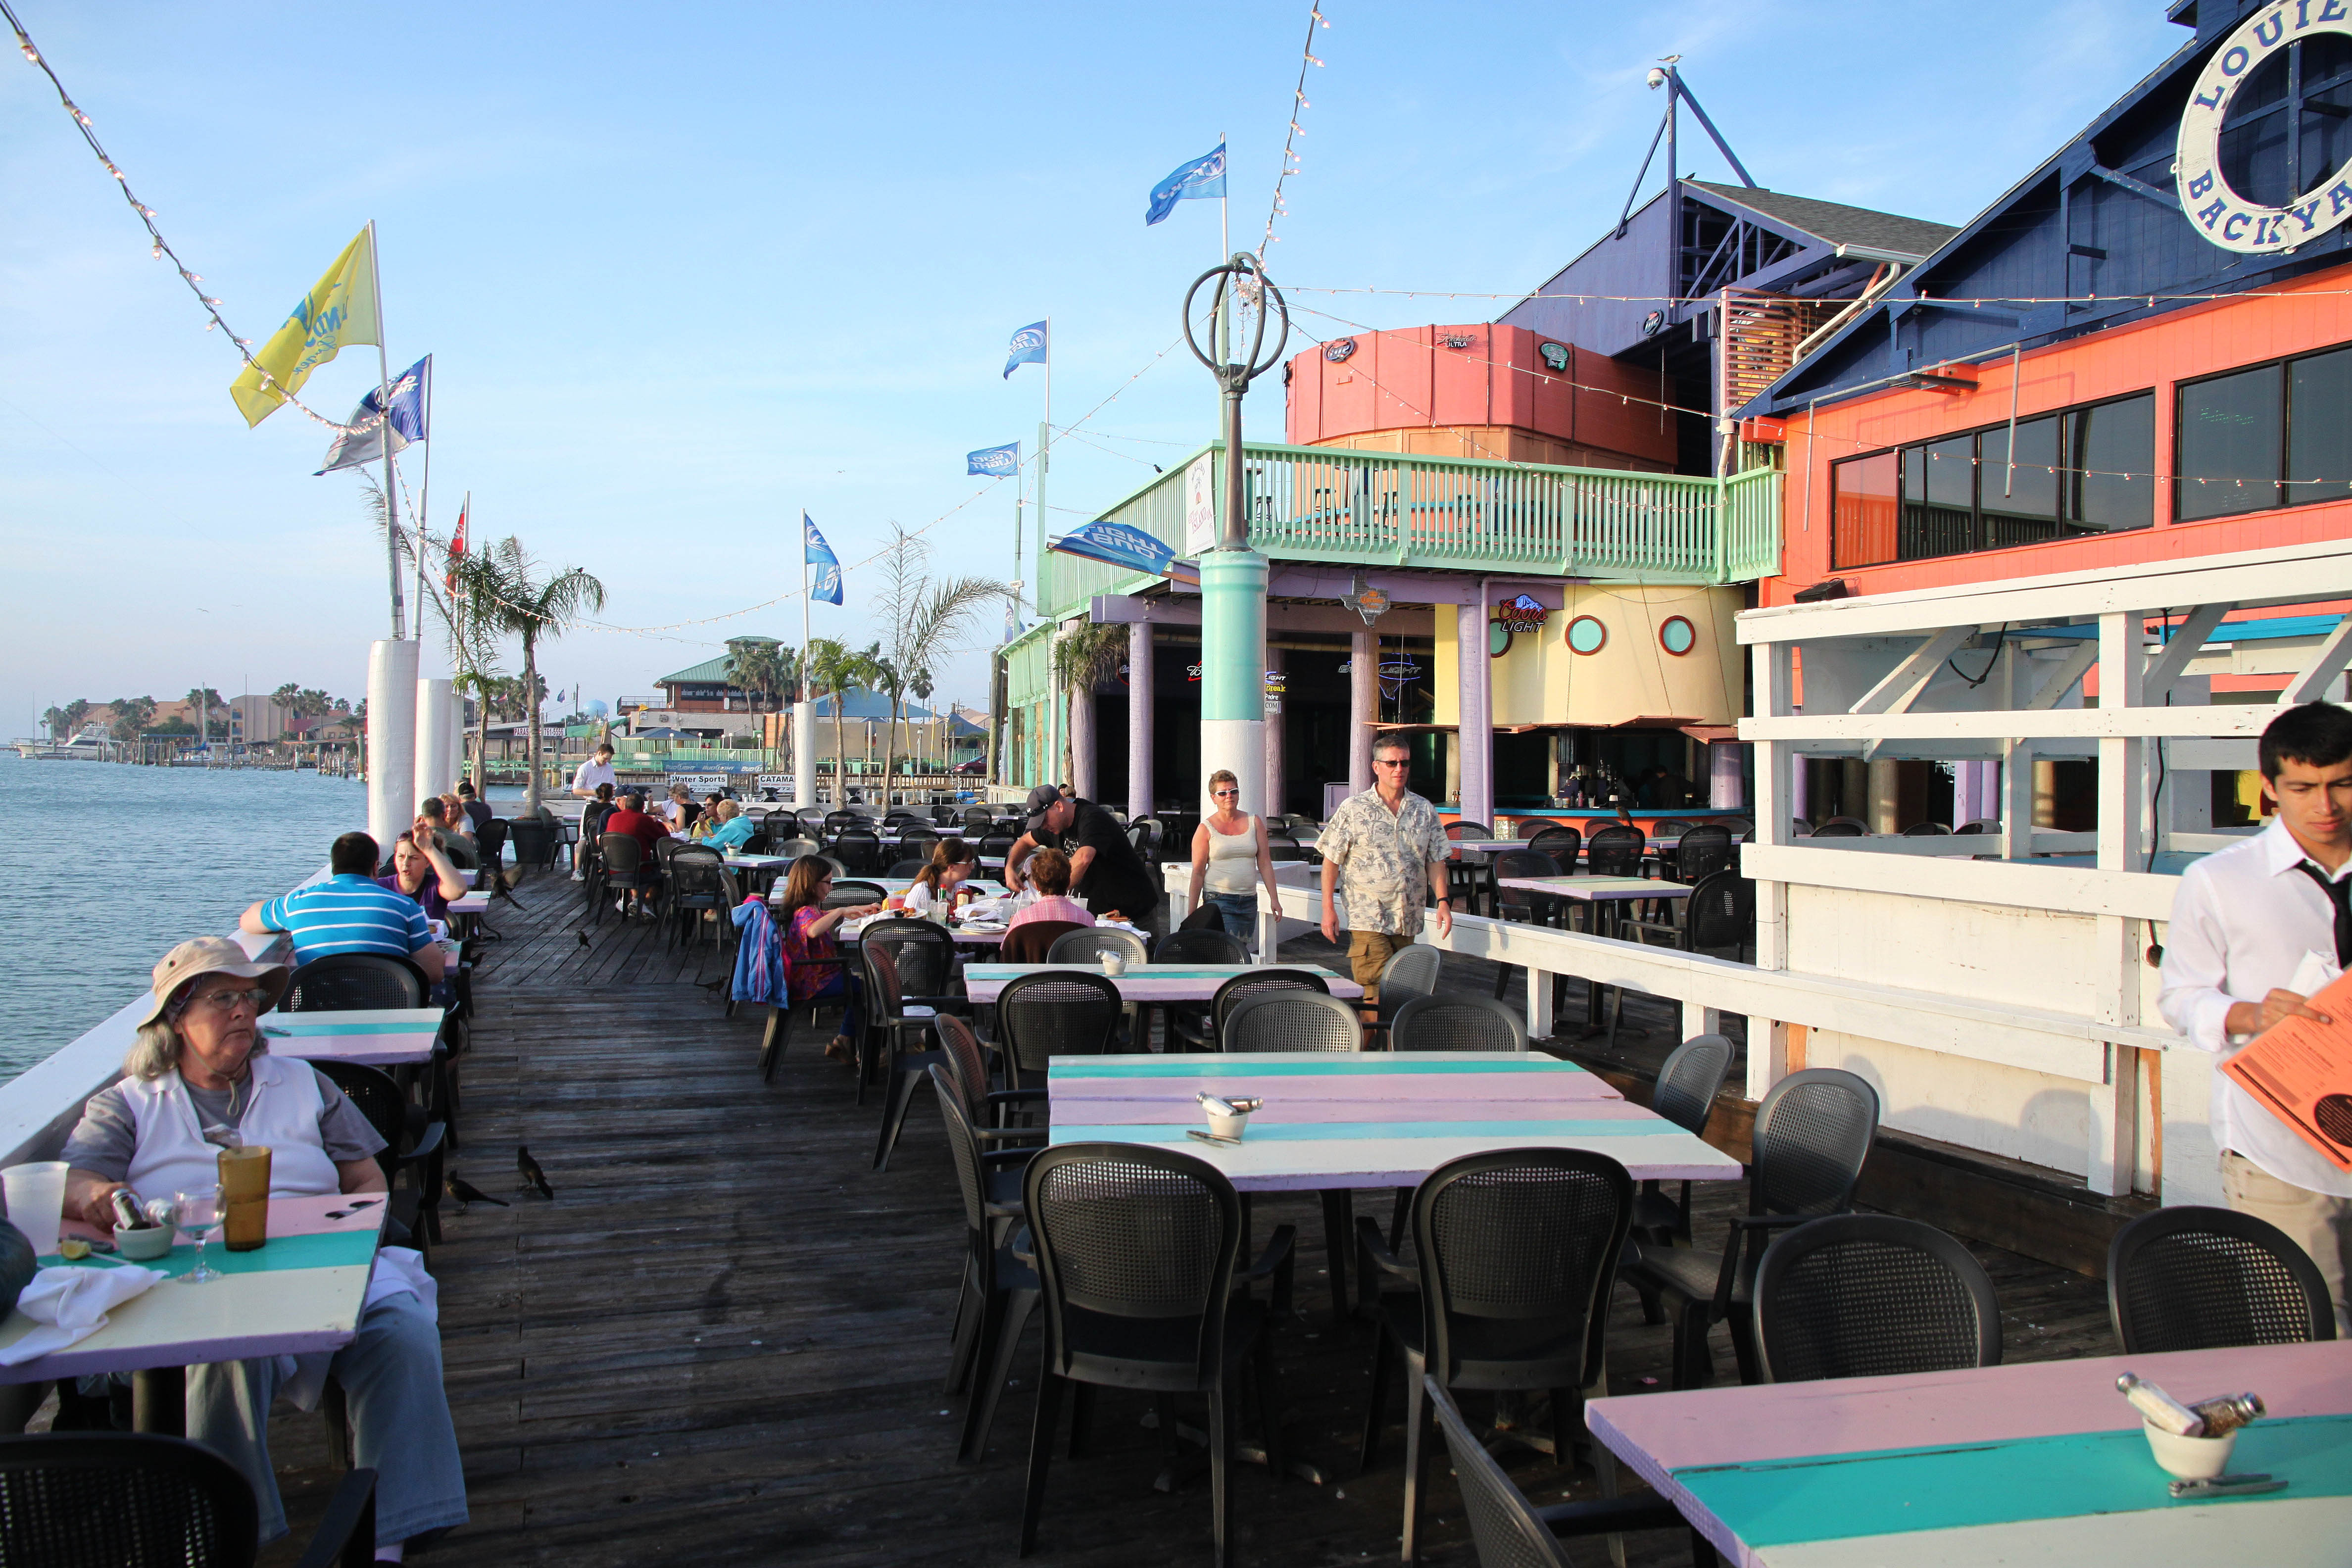 File:01d - SOUTH PADRE ISLAND, Louie's Backyard Restaurant ...